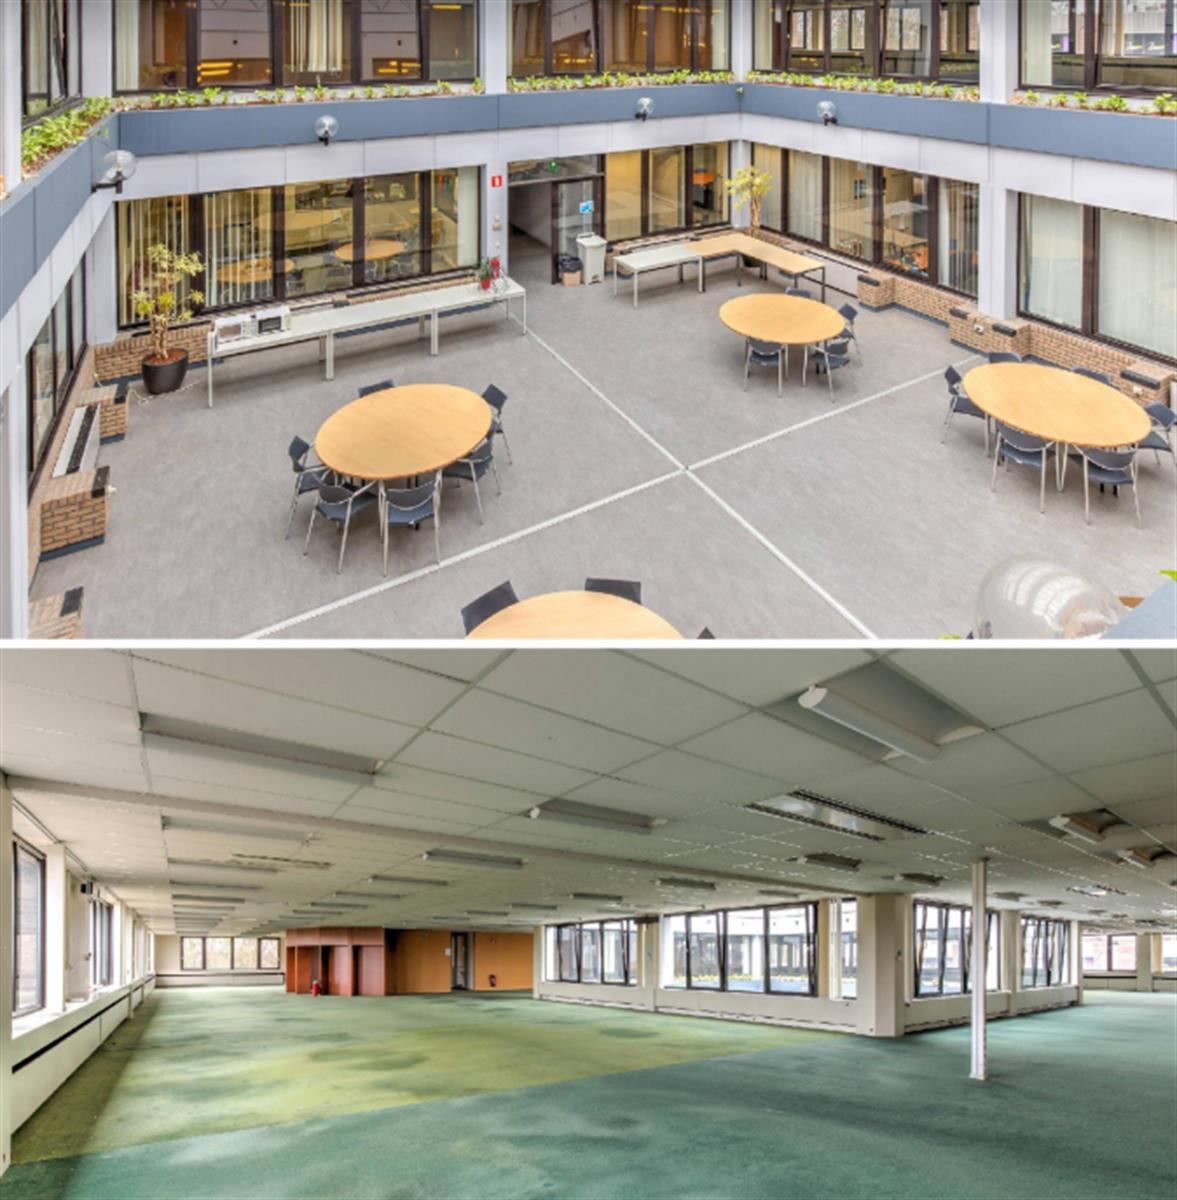 kantoor te koop VV2006 - Kantoorgebouw - Imperiastraat 8, 1930 Zaventem, België 2